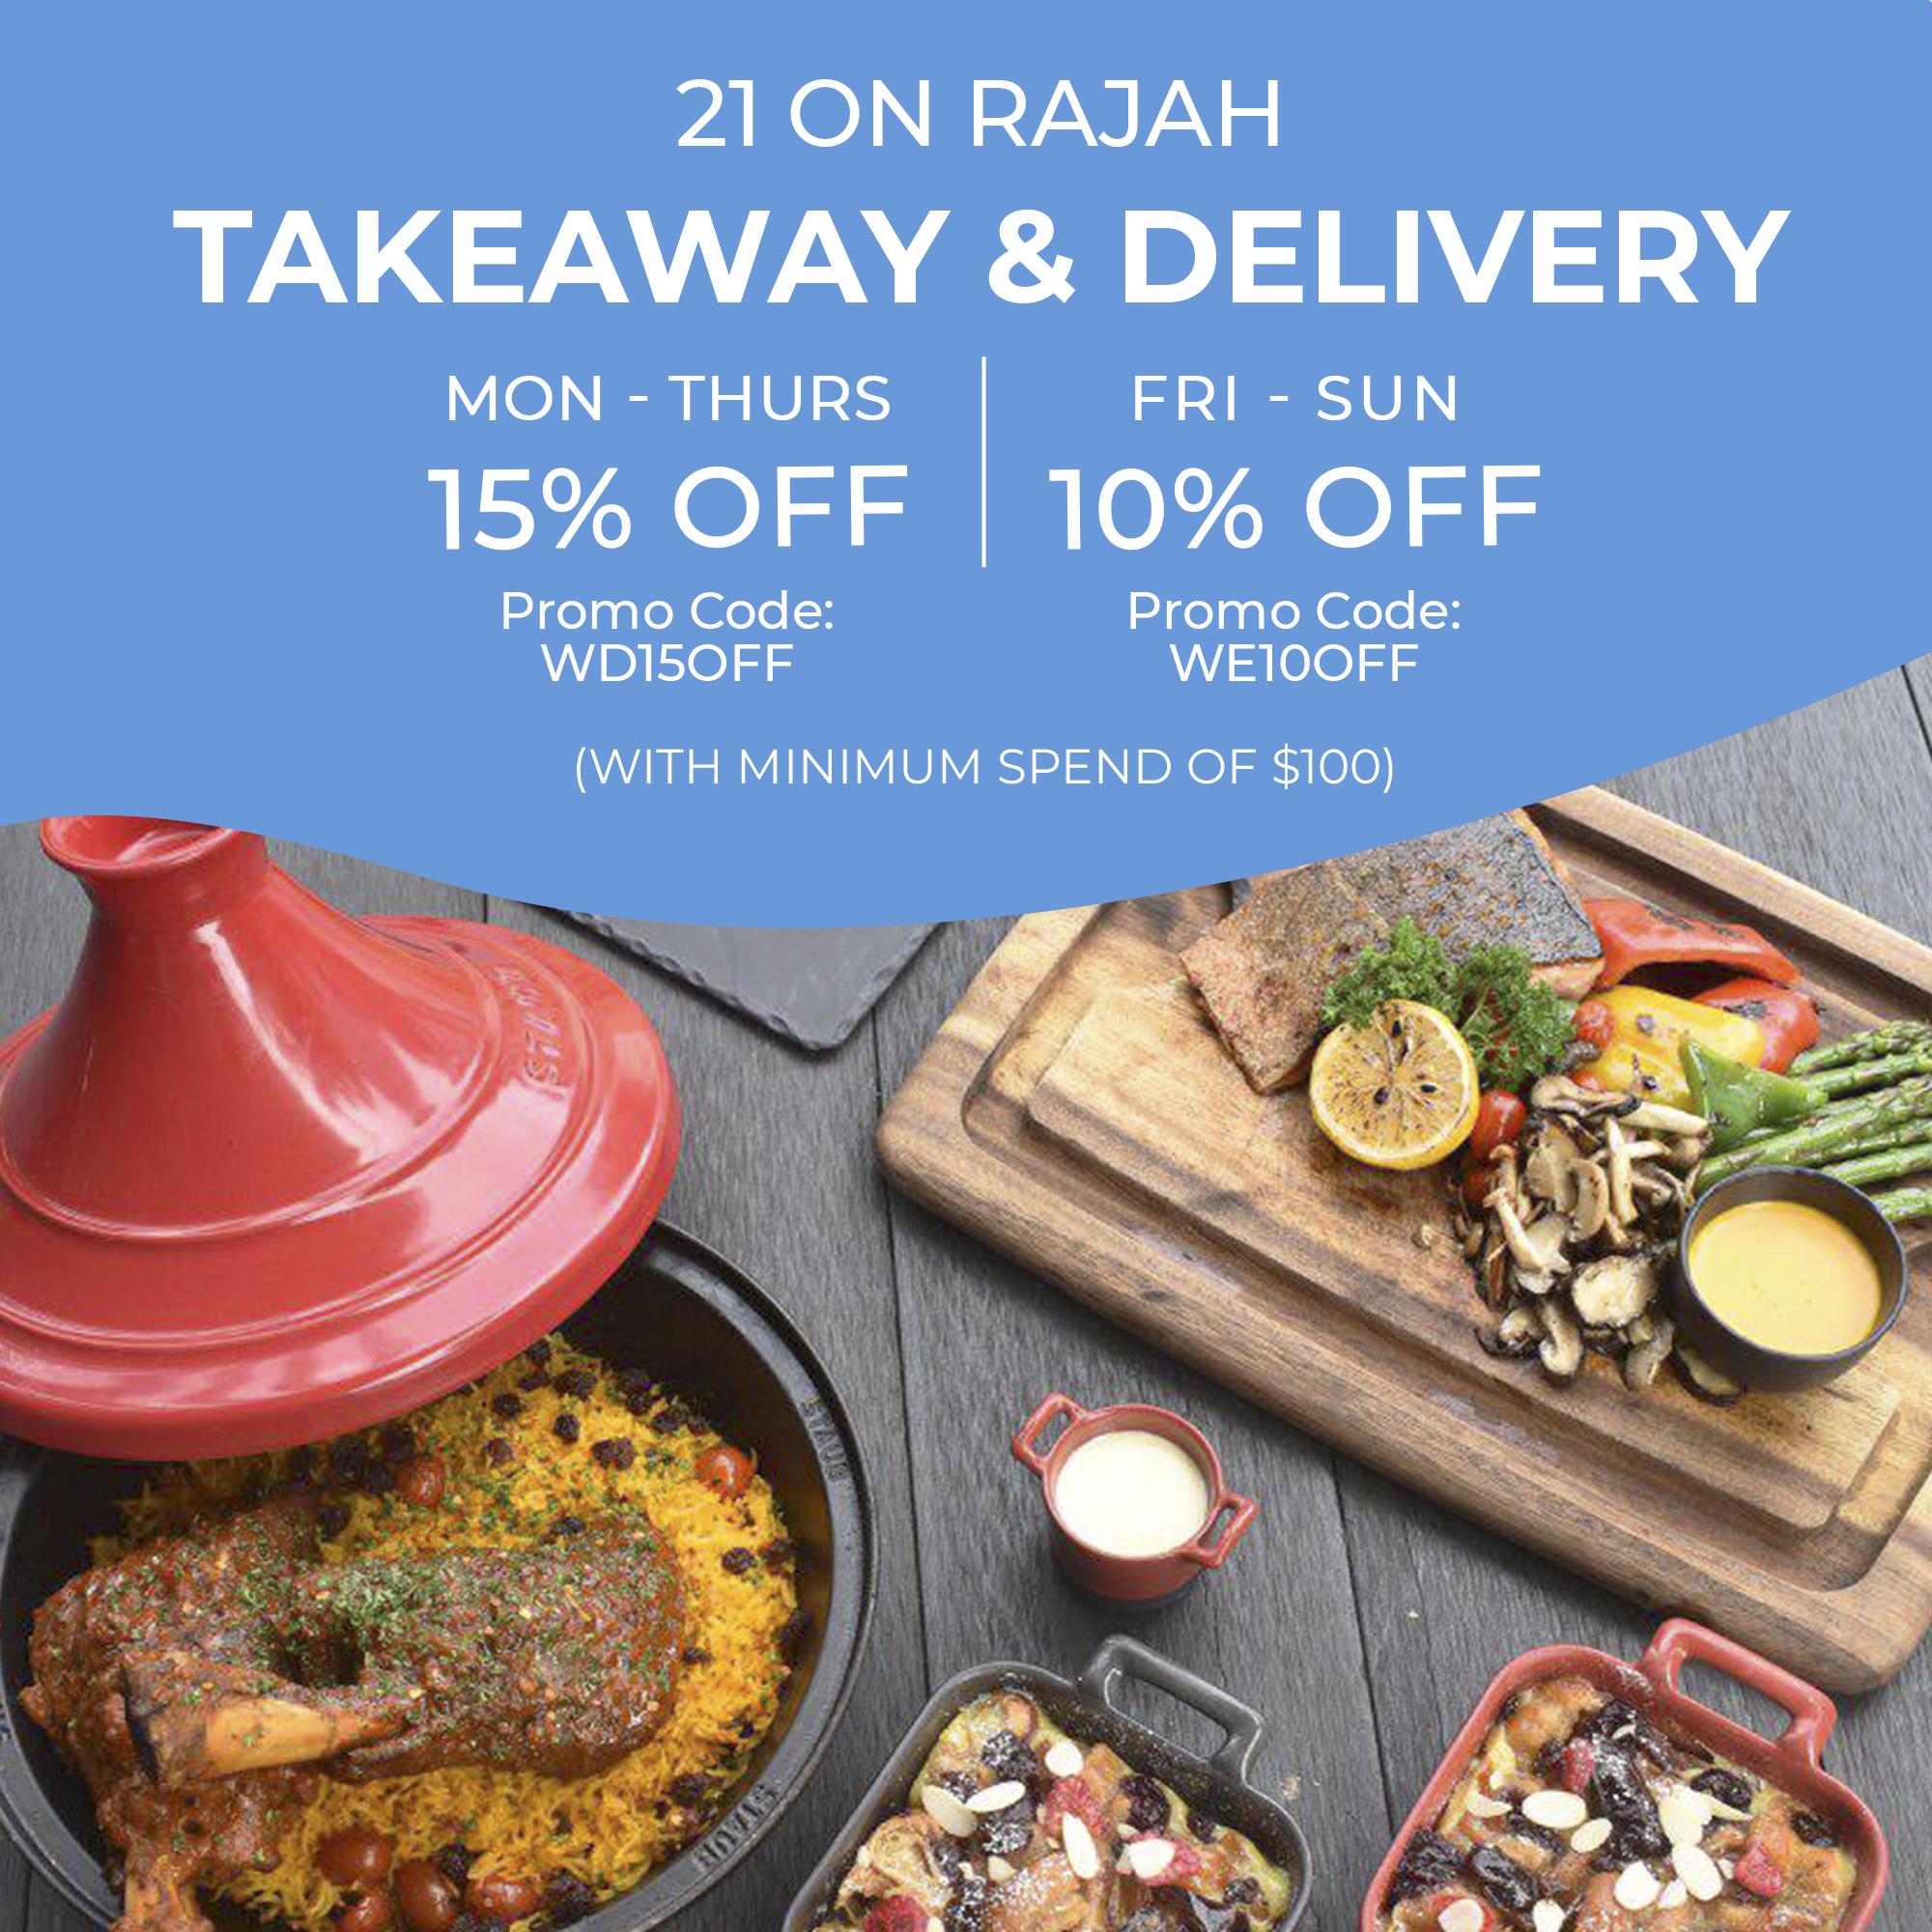 21 on Rajah: Islandwide delivery